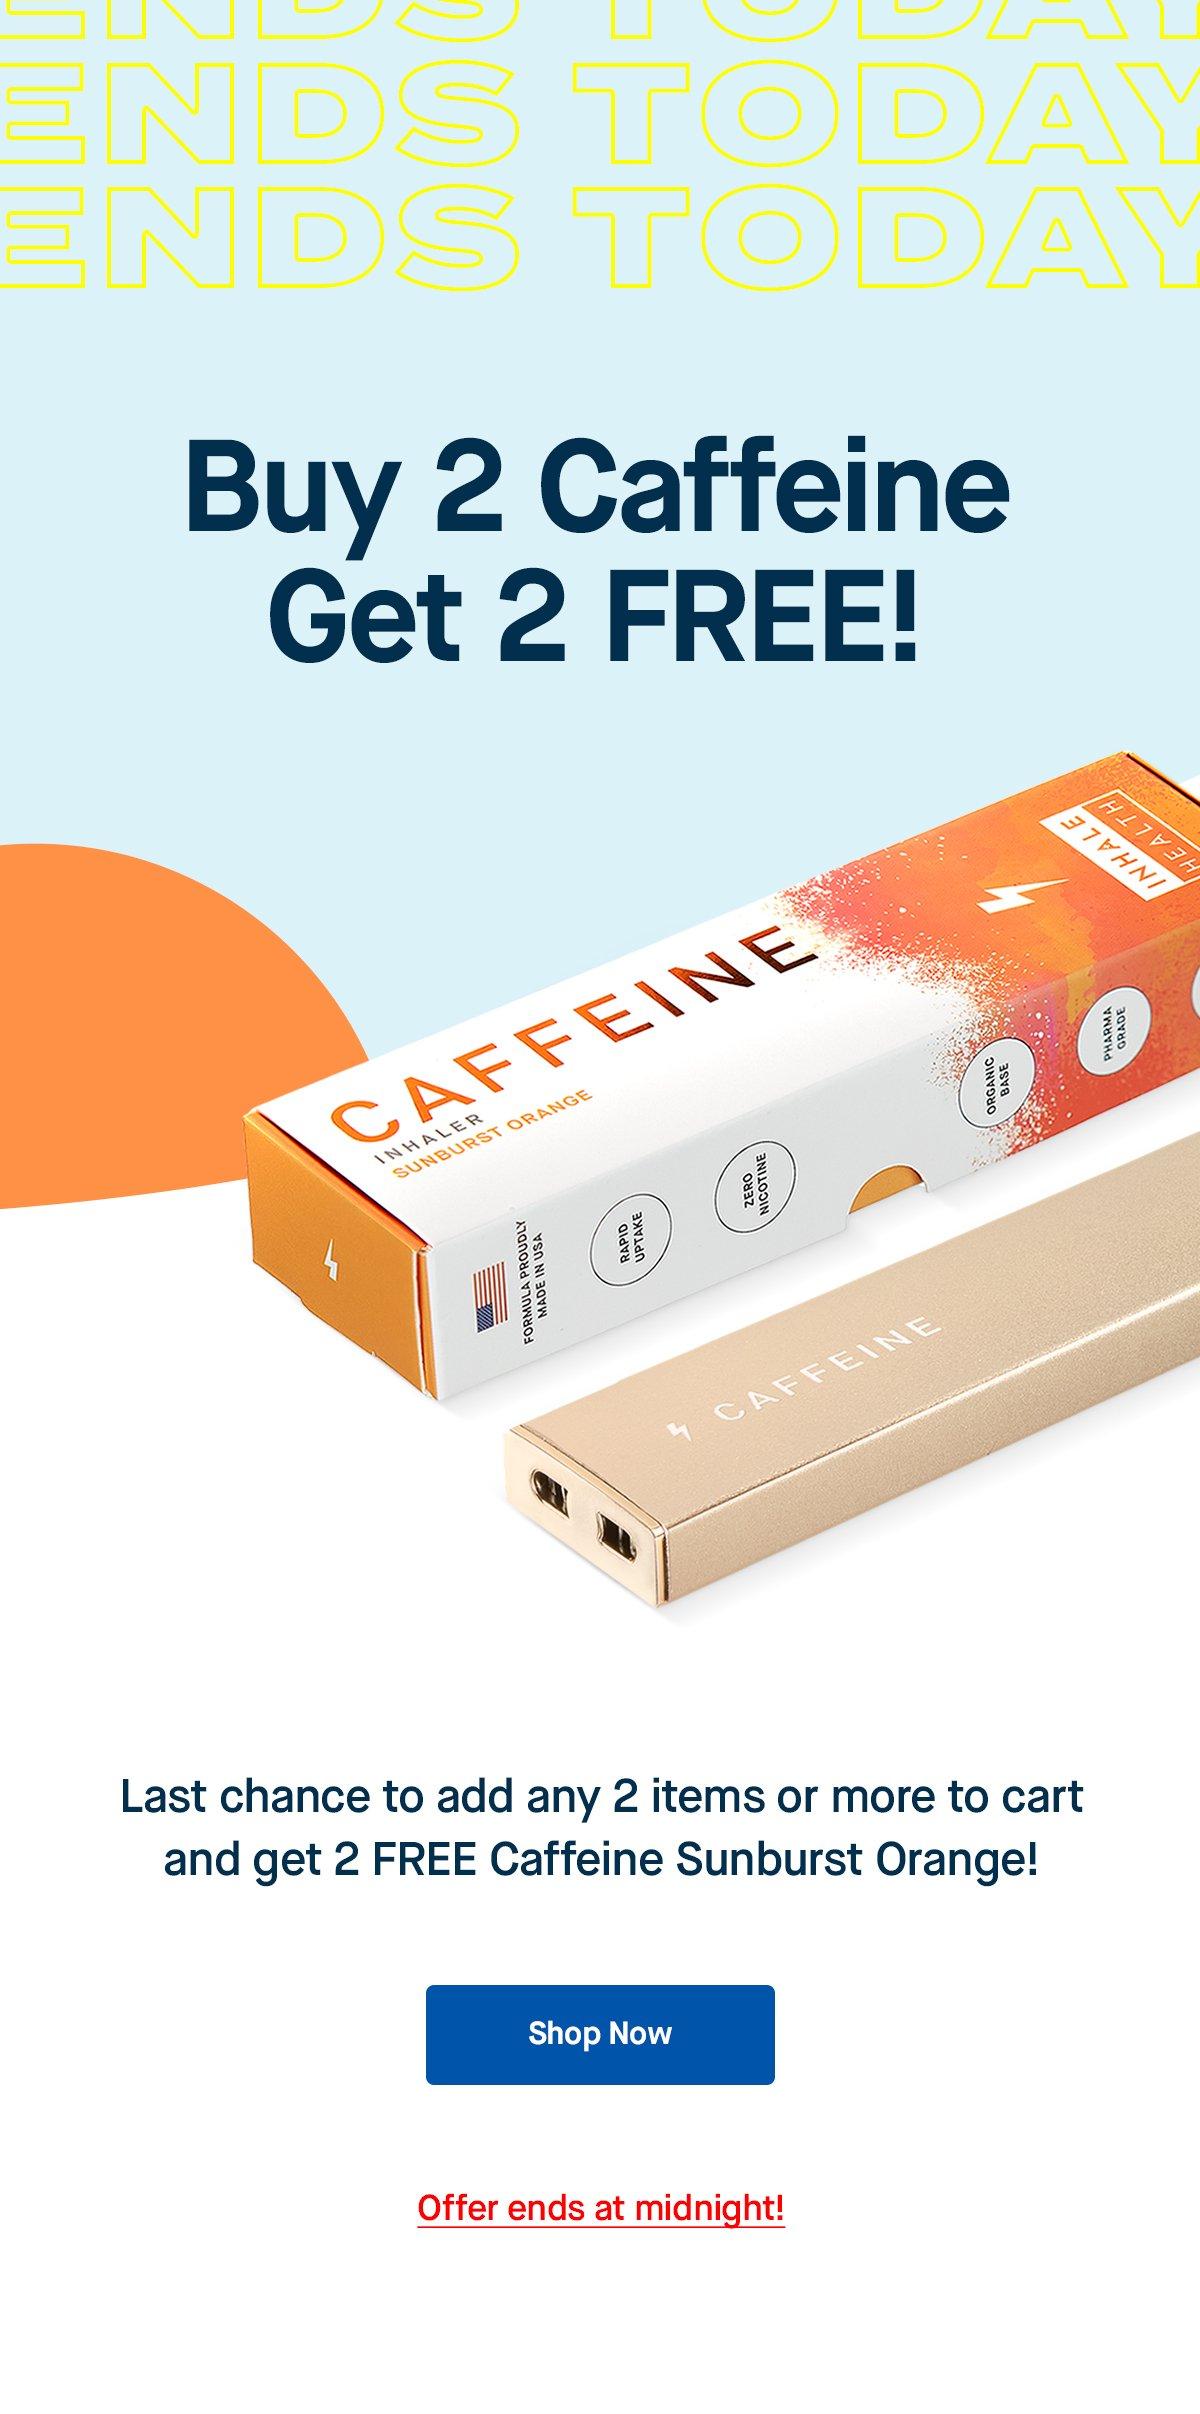 Inhale Health: ⚡ Ends Today ⚡ BUY 2 GET 2 Free Caffeine ...